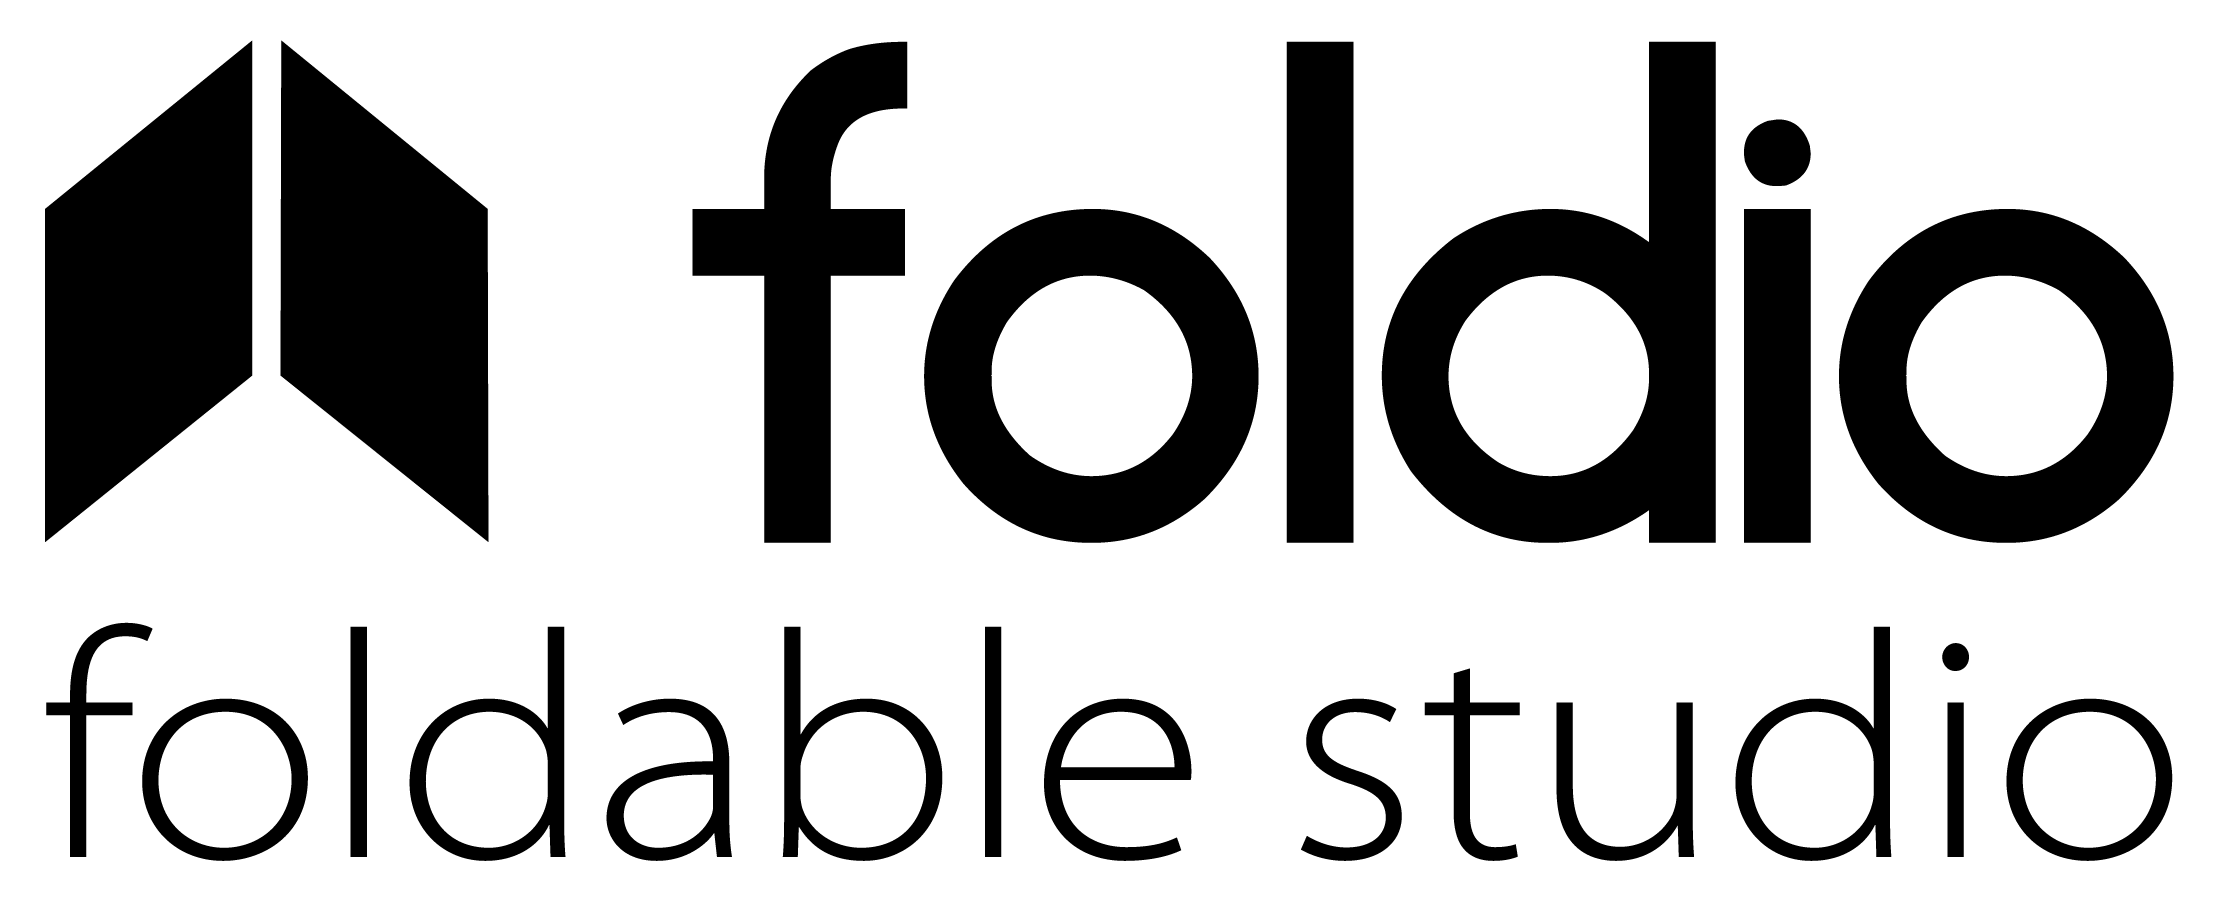 foldio.cz